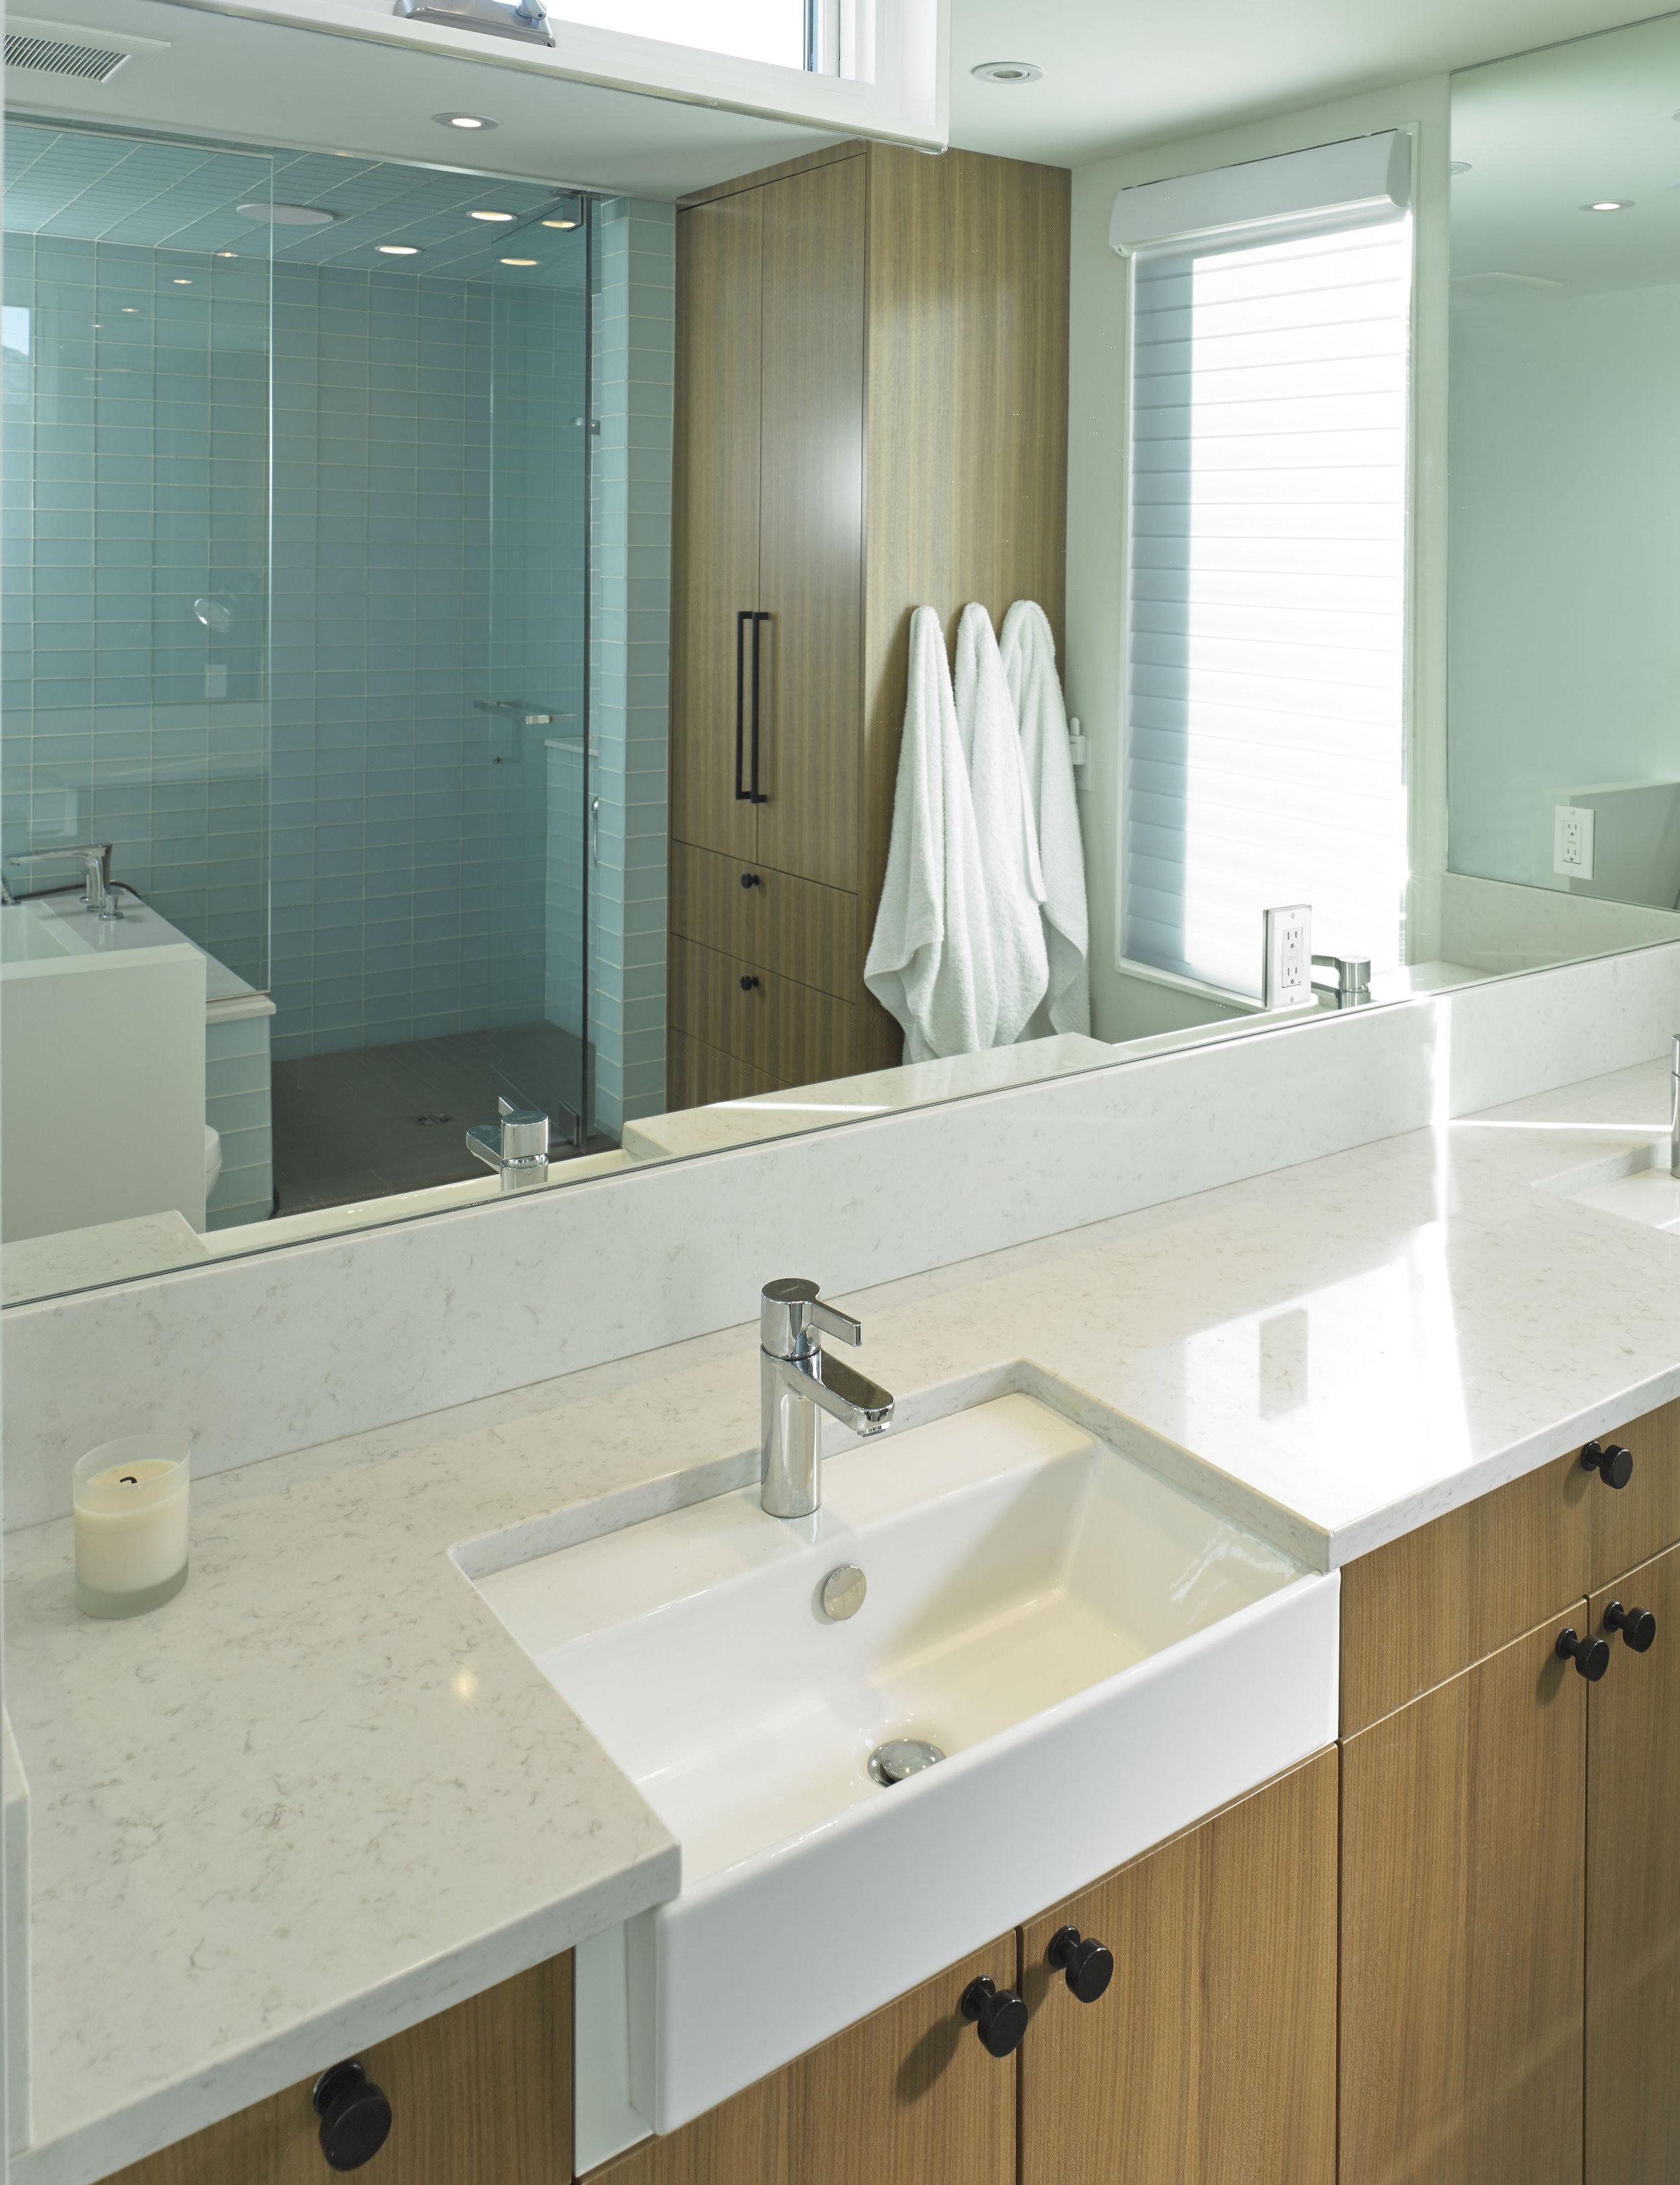 turkel_modern_design_prefab_home_bankview_house_calgary_bathroom.jpg